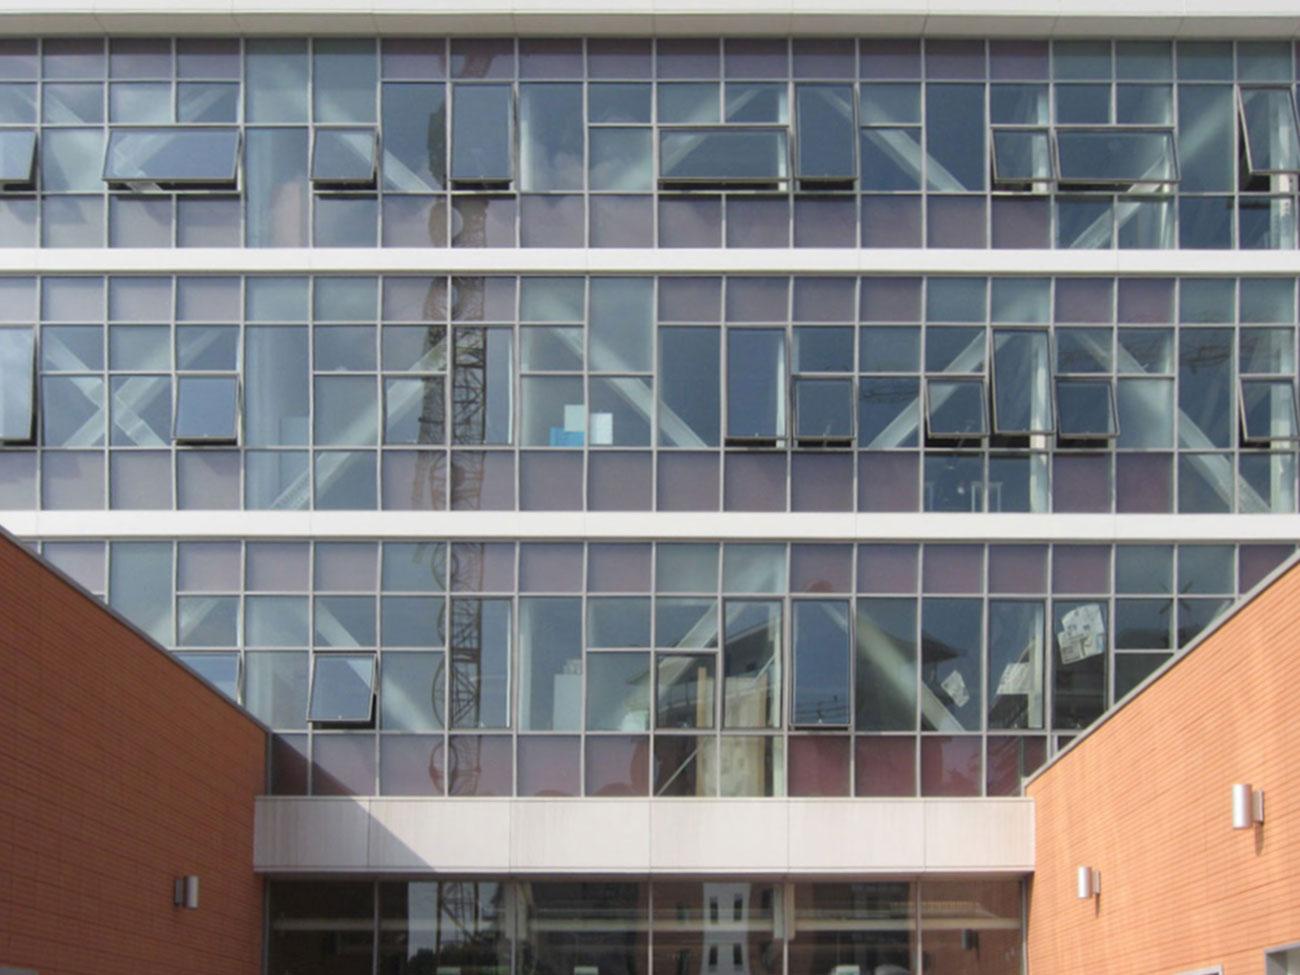 05-Istituto-Falcone-AIACE-srl (3)